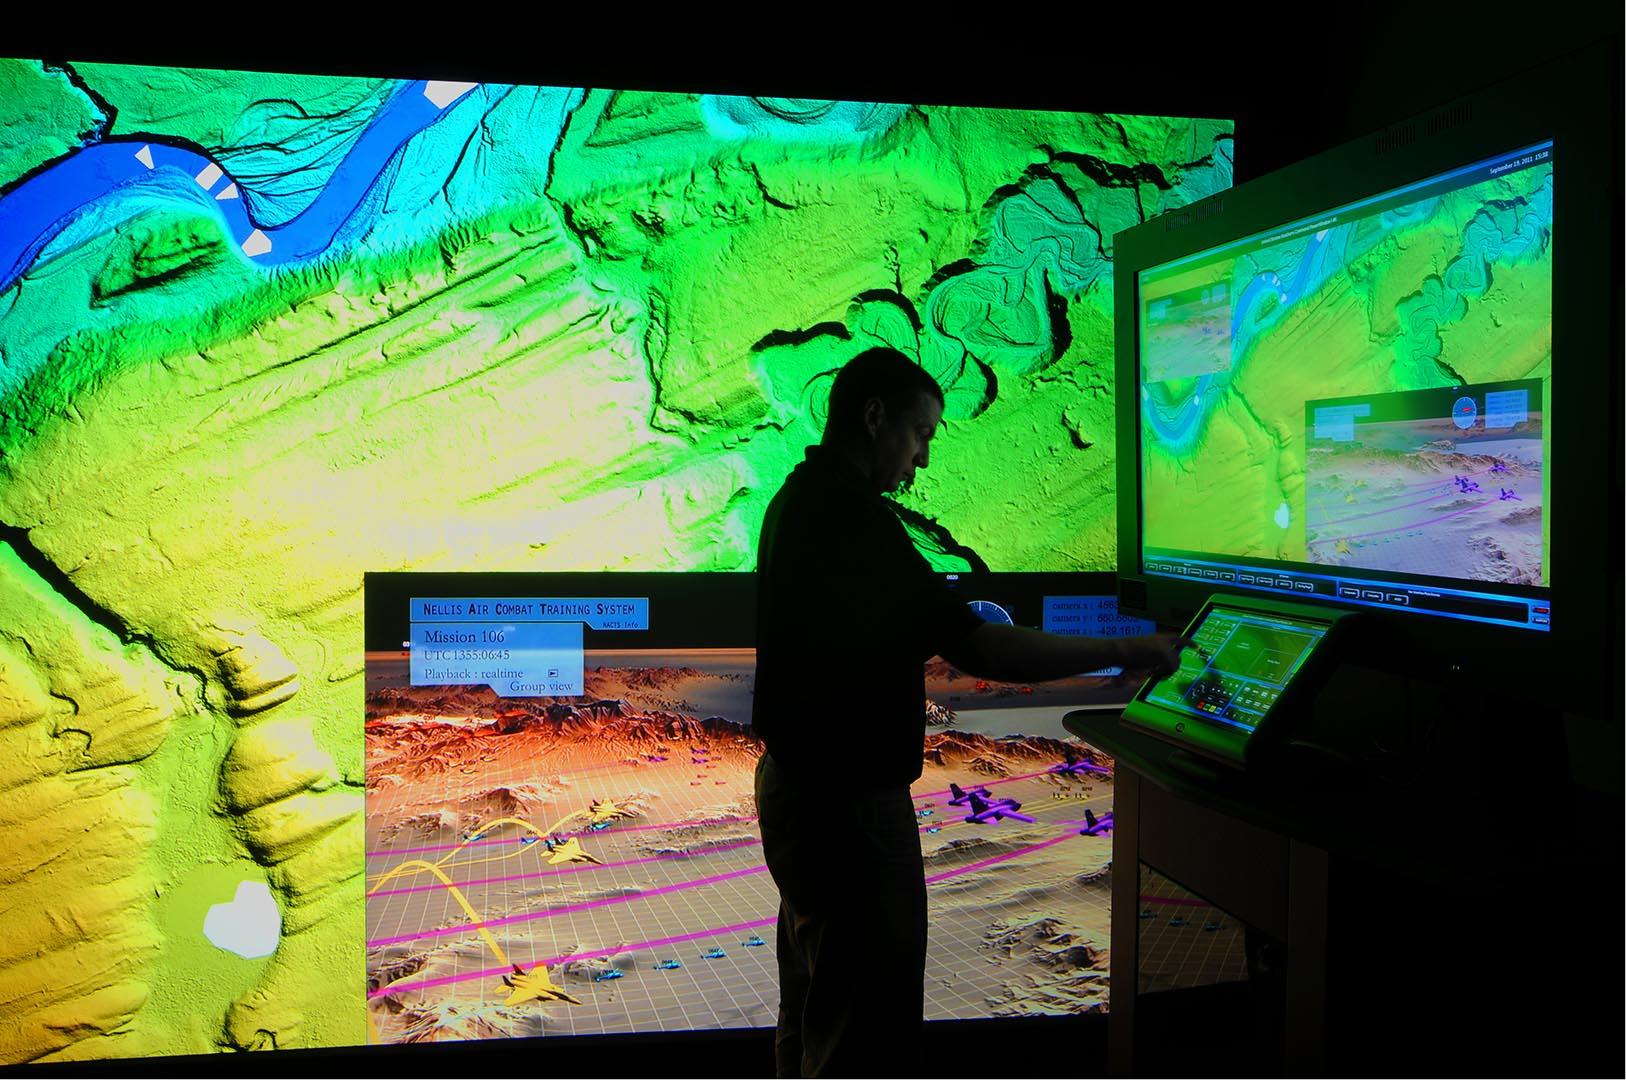 air force combat AV training system virtual reality